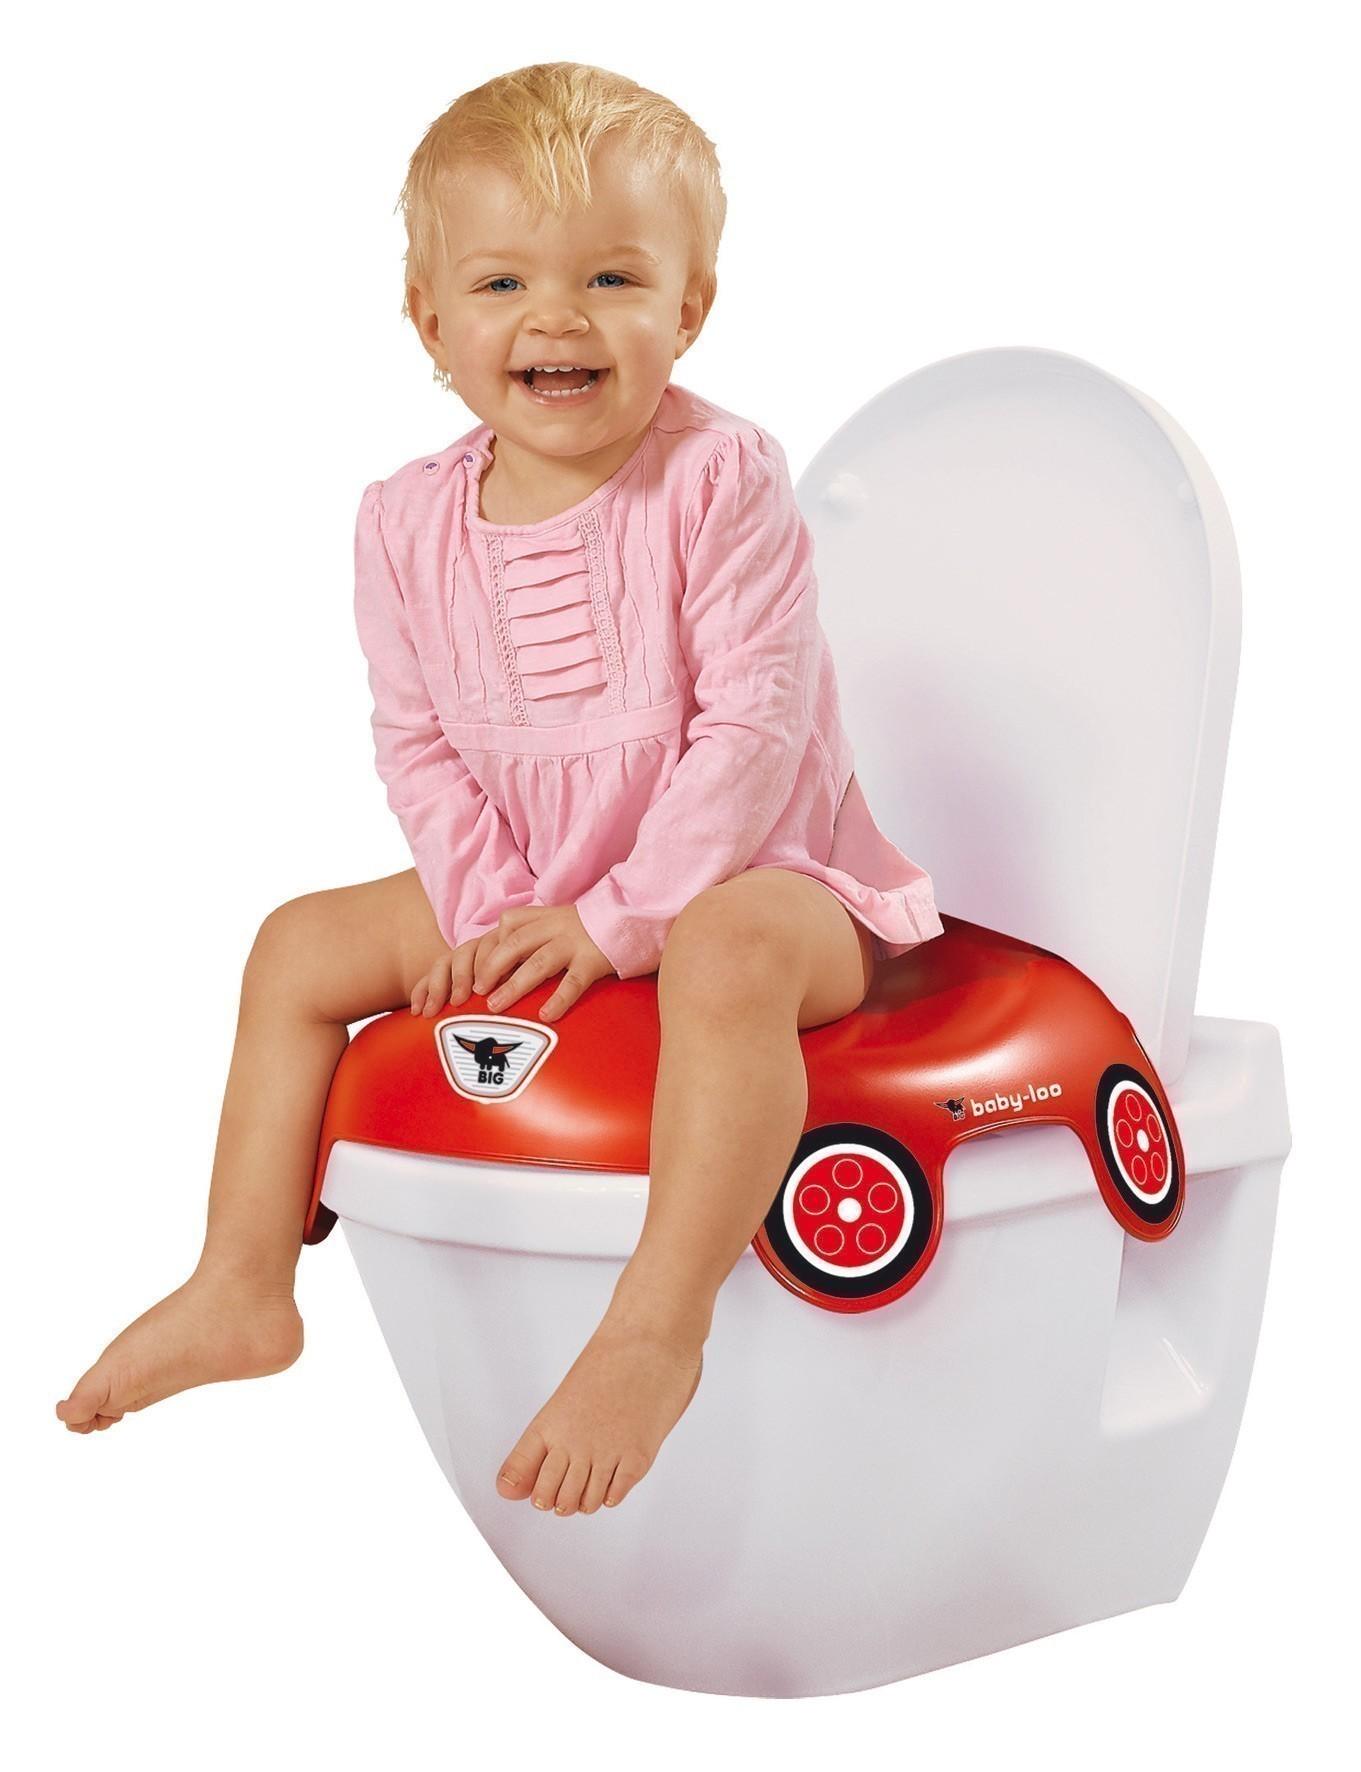 BIG Toilettensitz / Toilettentrainer Töpfchen Baby Loo Bobby Car 56806 Bild 2